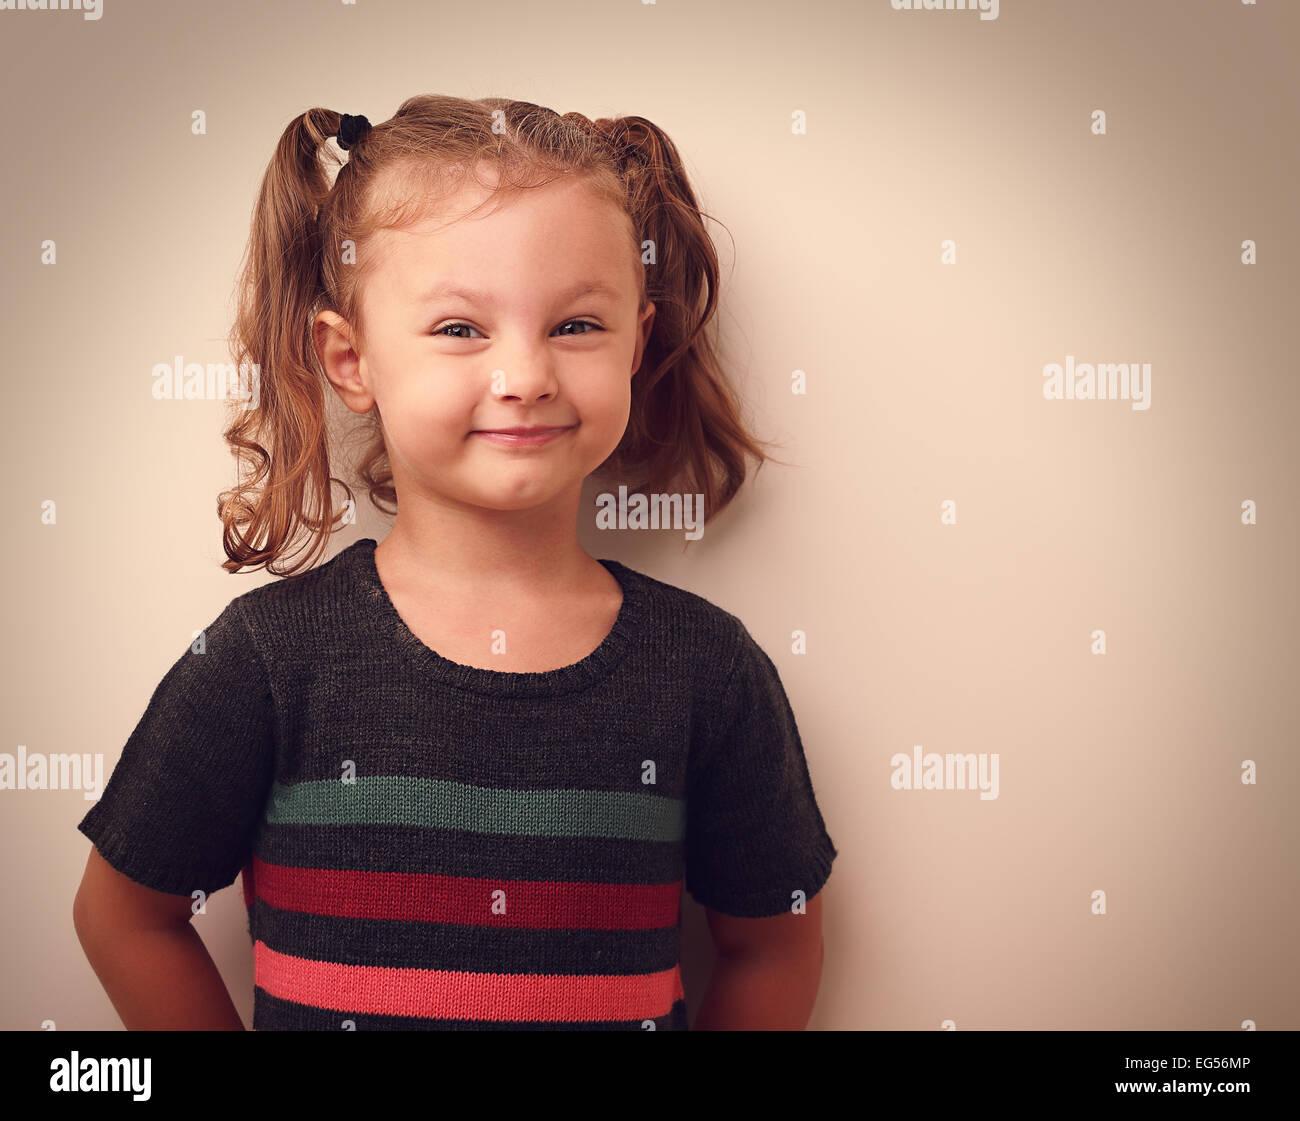 Happy grimacing kid girl looking on empty copy space background. Vintage portrait - Stock Image